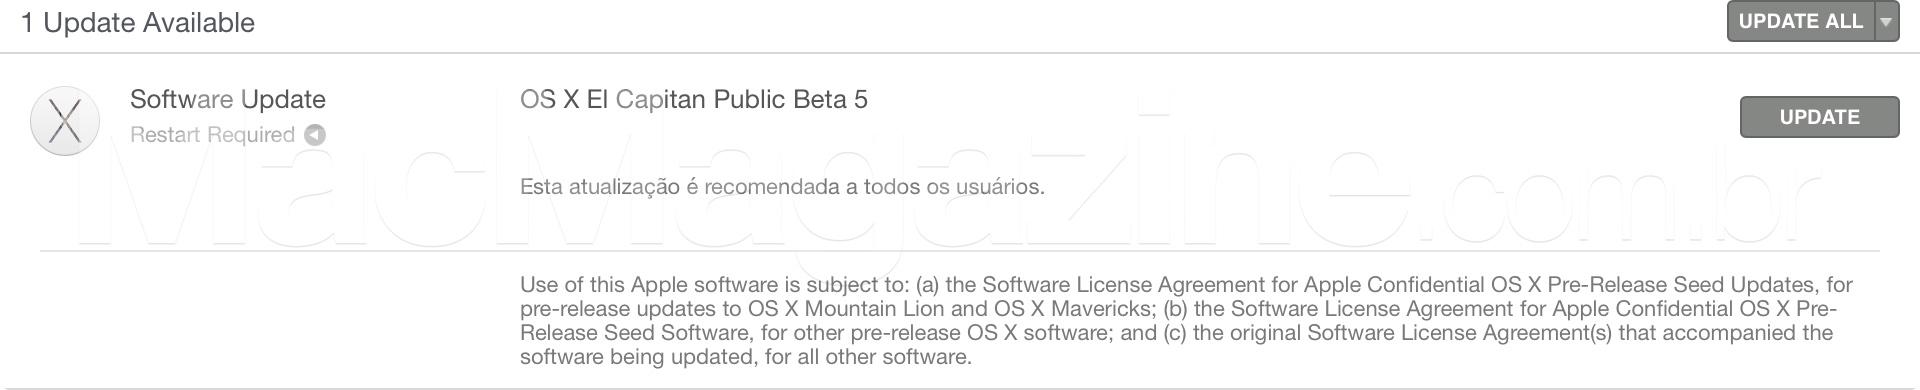 Beta público do OS X El Capitan 10.11